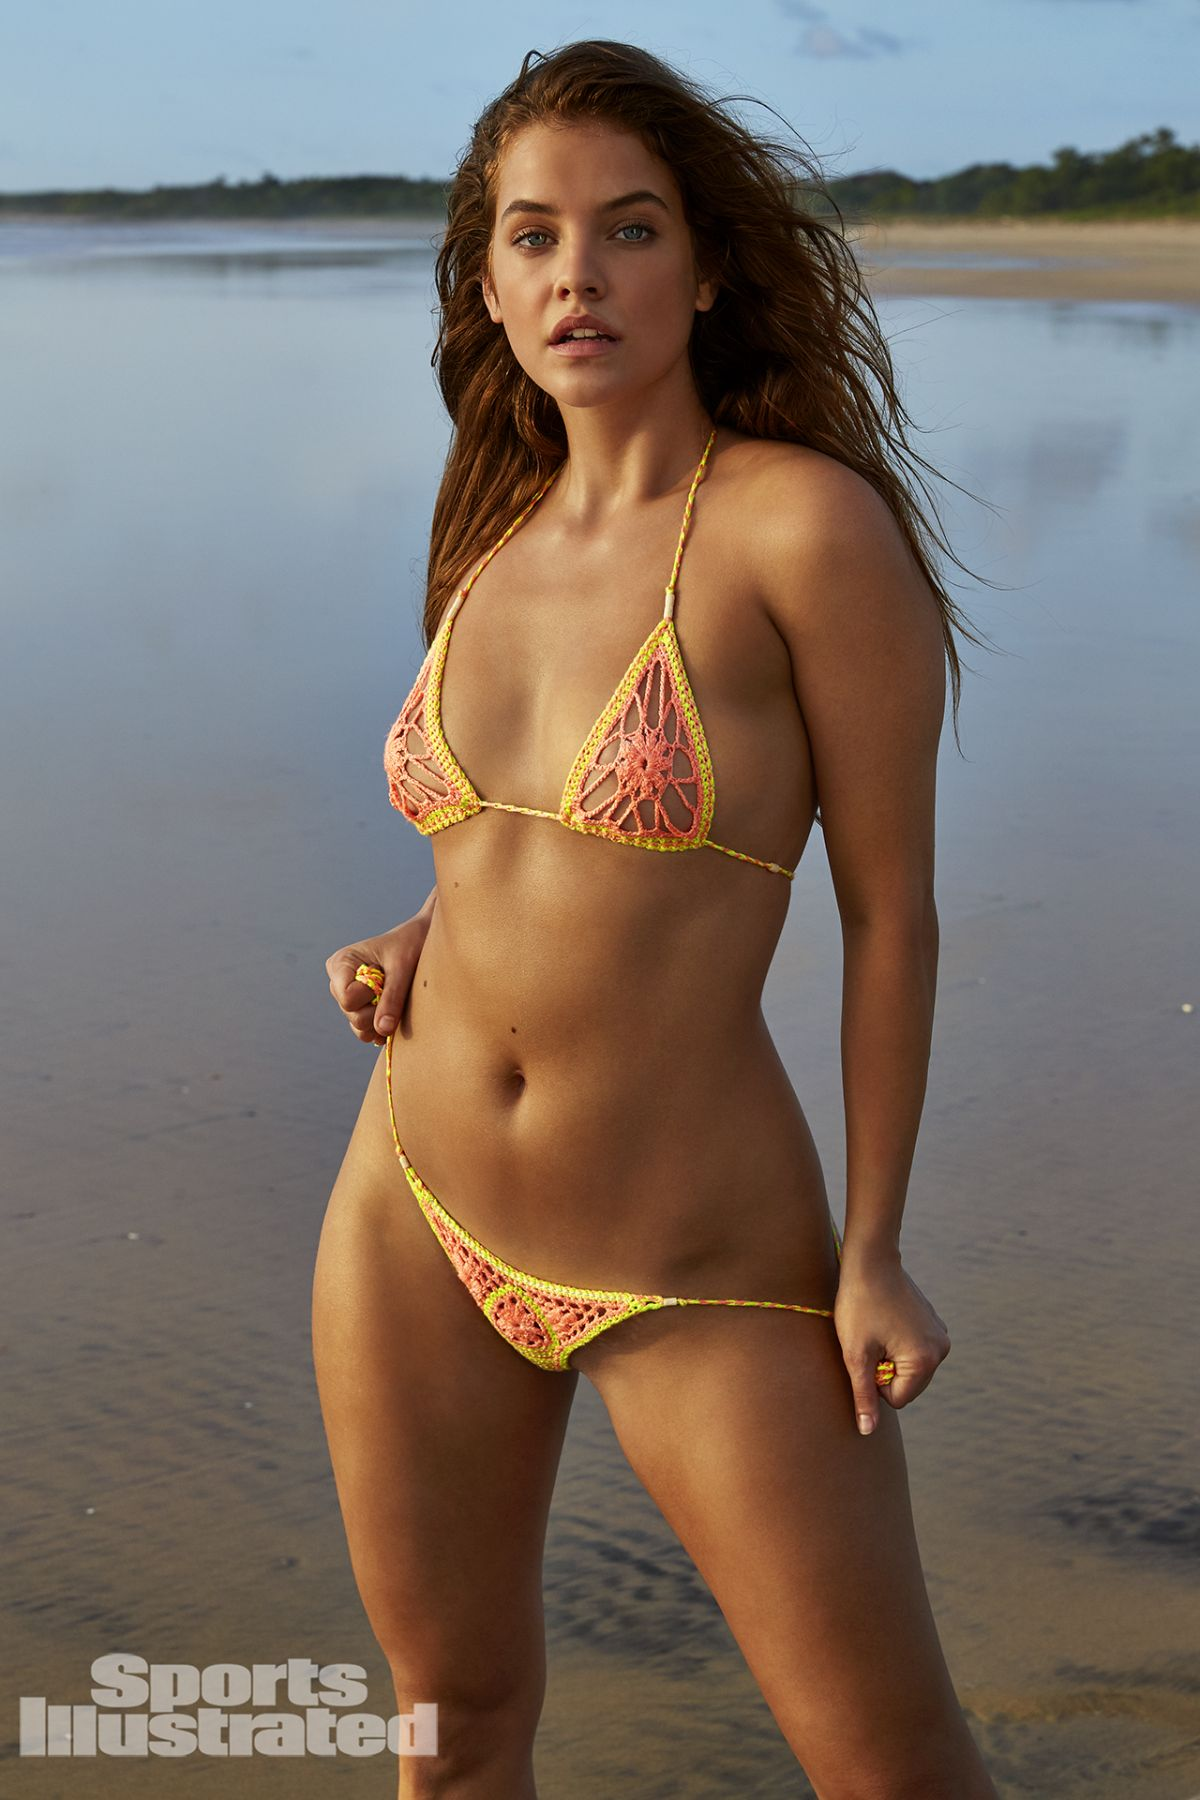 illustrated swimsuit palvin barbara sports issue si bikini swim through costa shoot hawtcelebs japan rica photographed macari james supermodels photoshoot